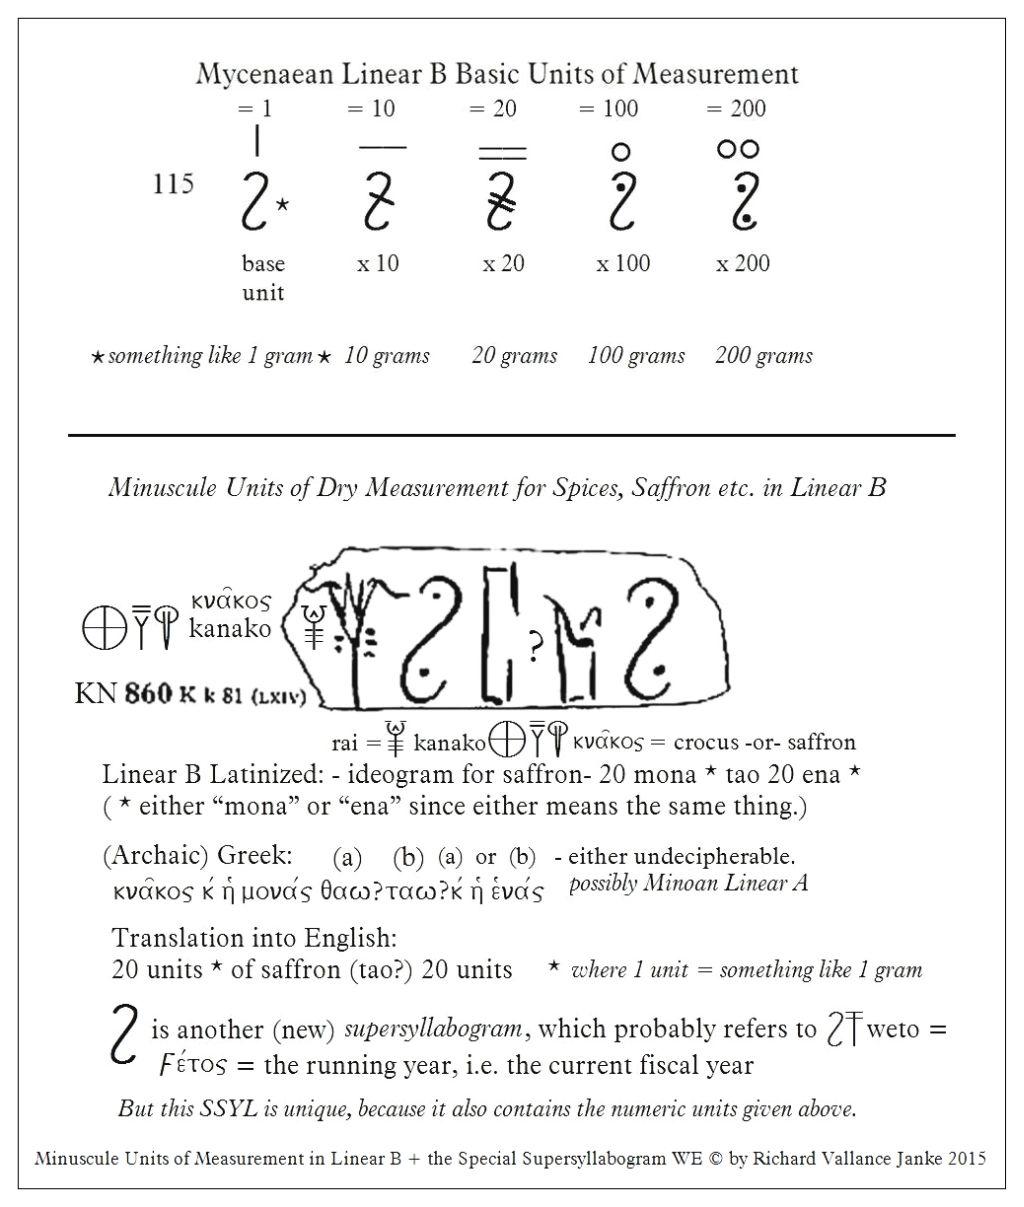 numerics | Minoan Linear A, Linear B, Knossos & Mycenae